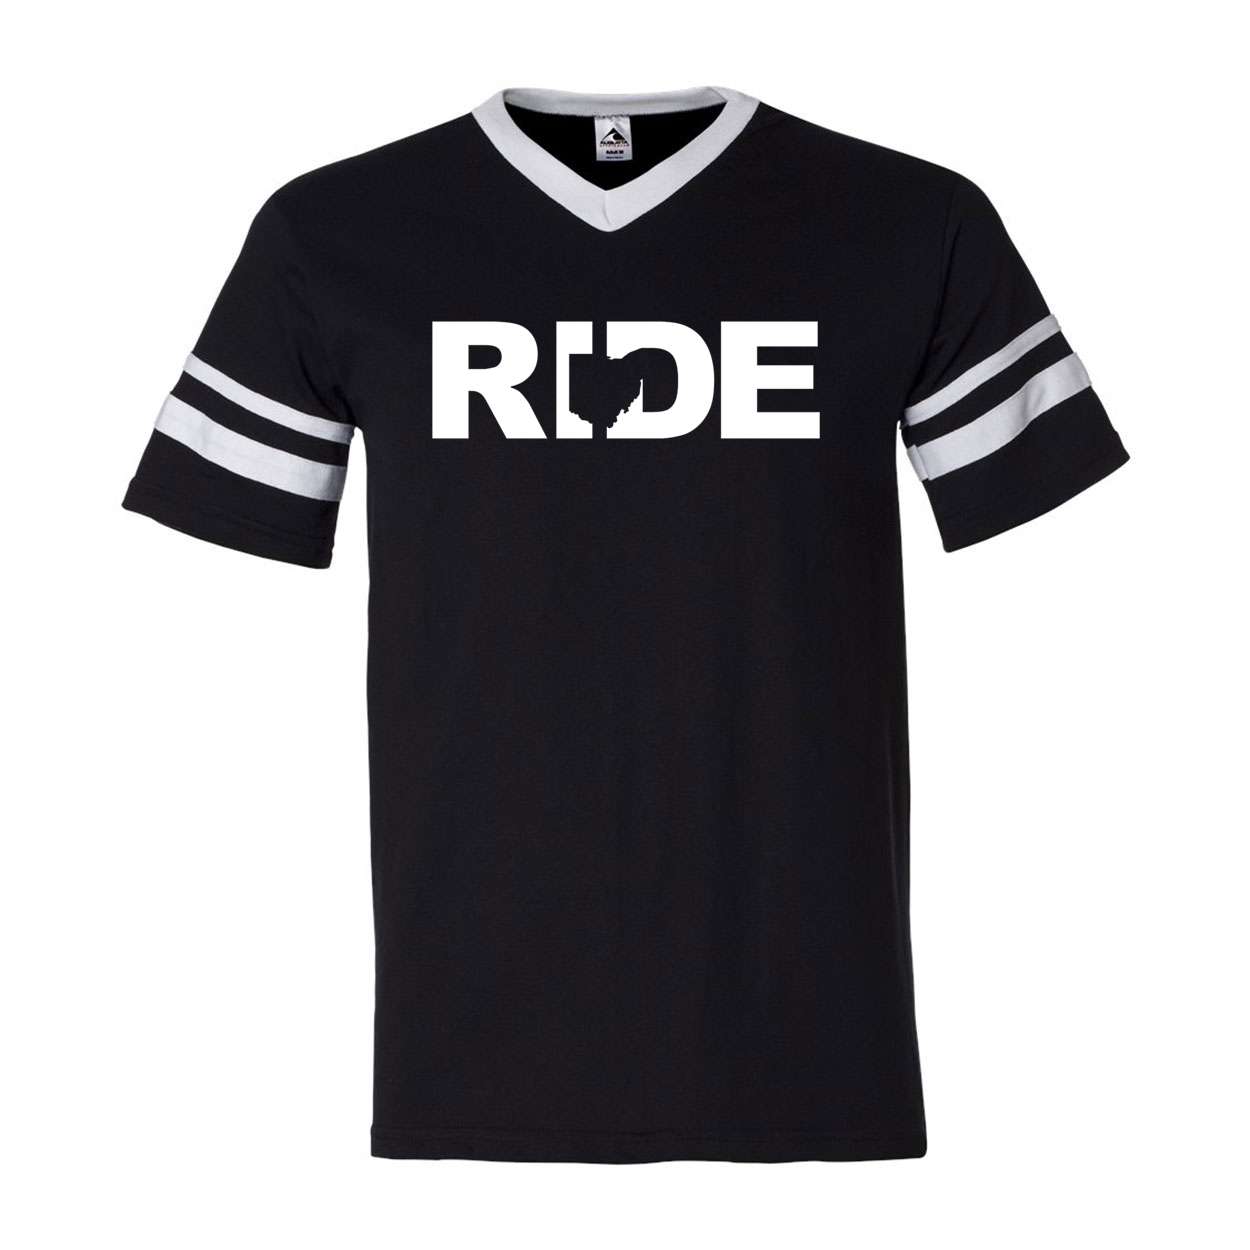 Ride Ohio Classic Premium Striped Jersey T-Shirt Black/White (White Logo)